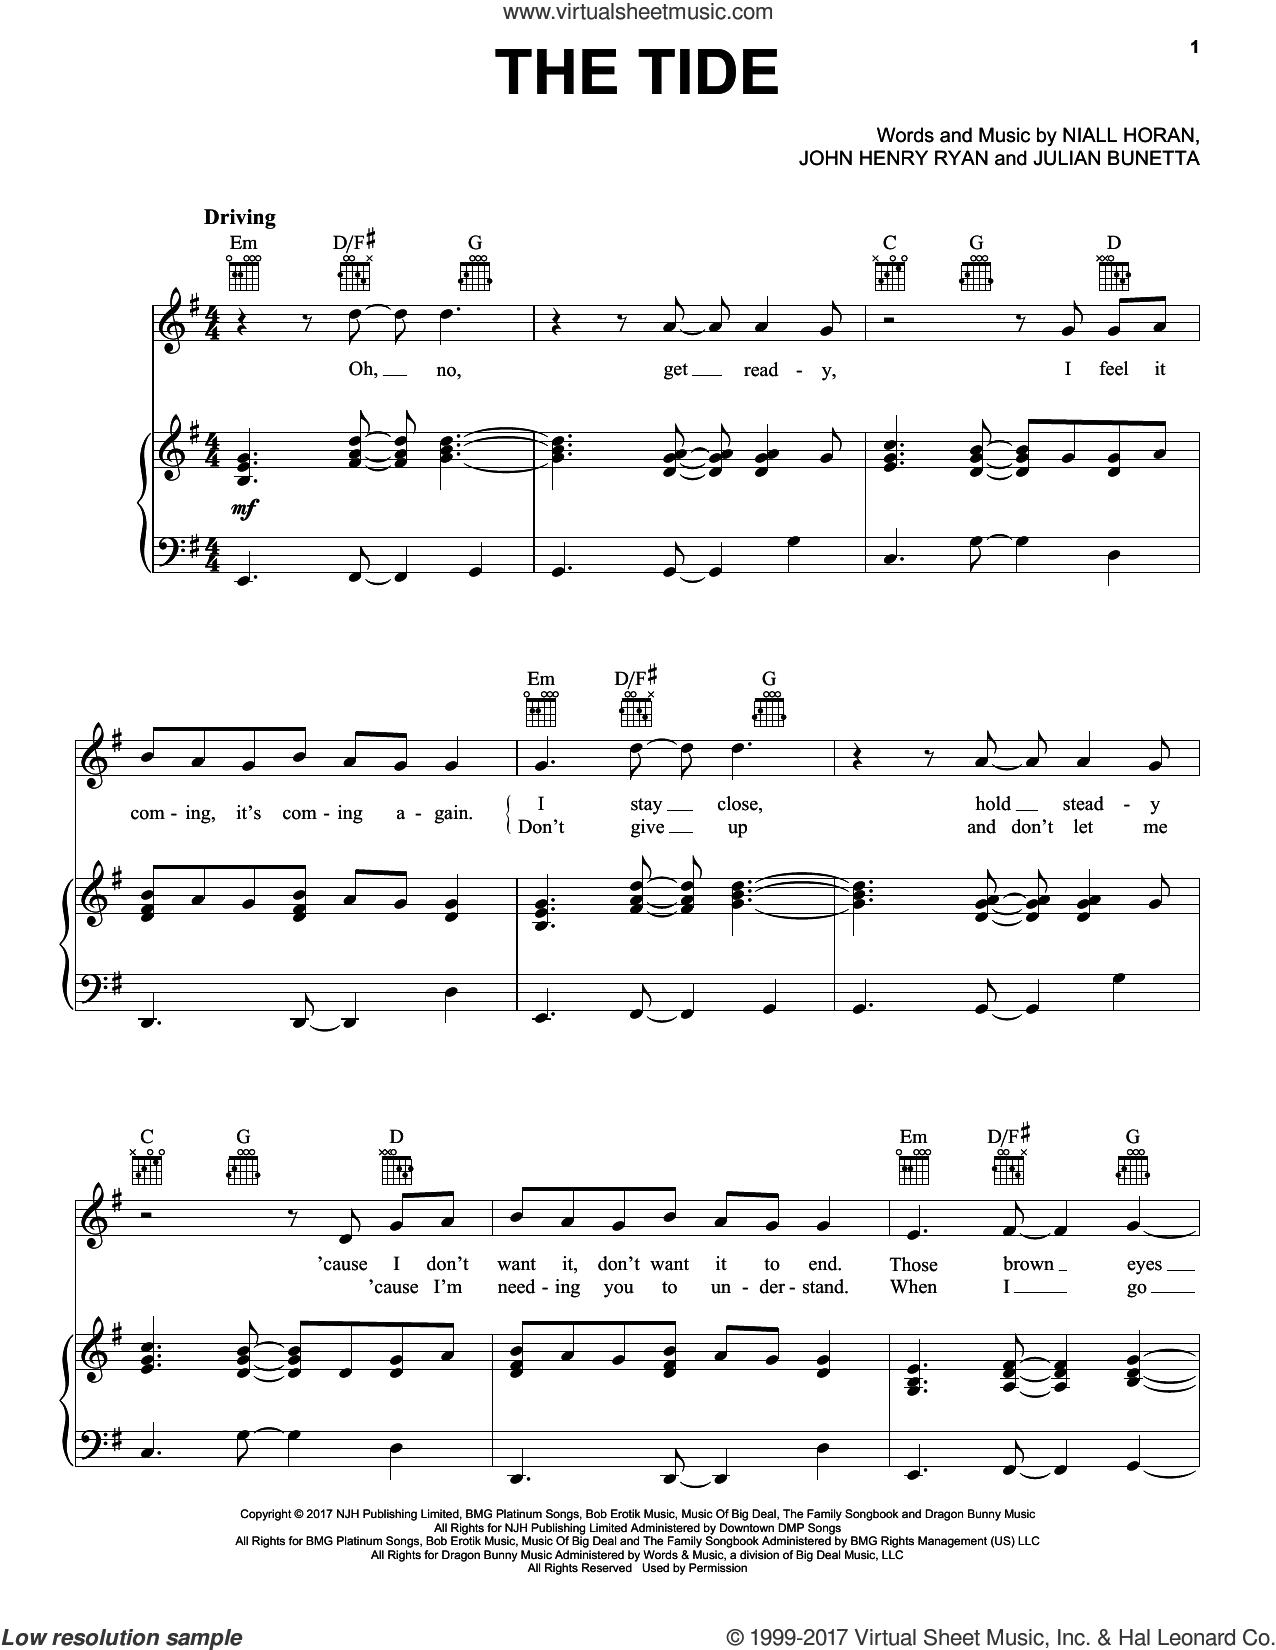 The Tide sheet music for voice, piano or guitar by Niall Horan, John Henry Ryan and Julian Bunetta, intermediate skill level